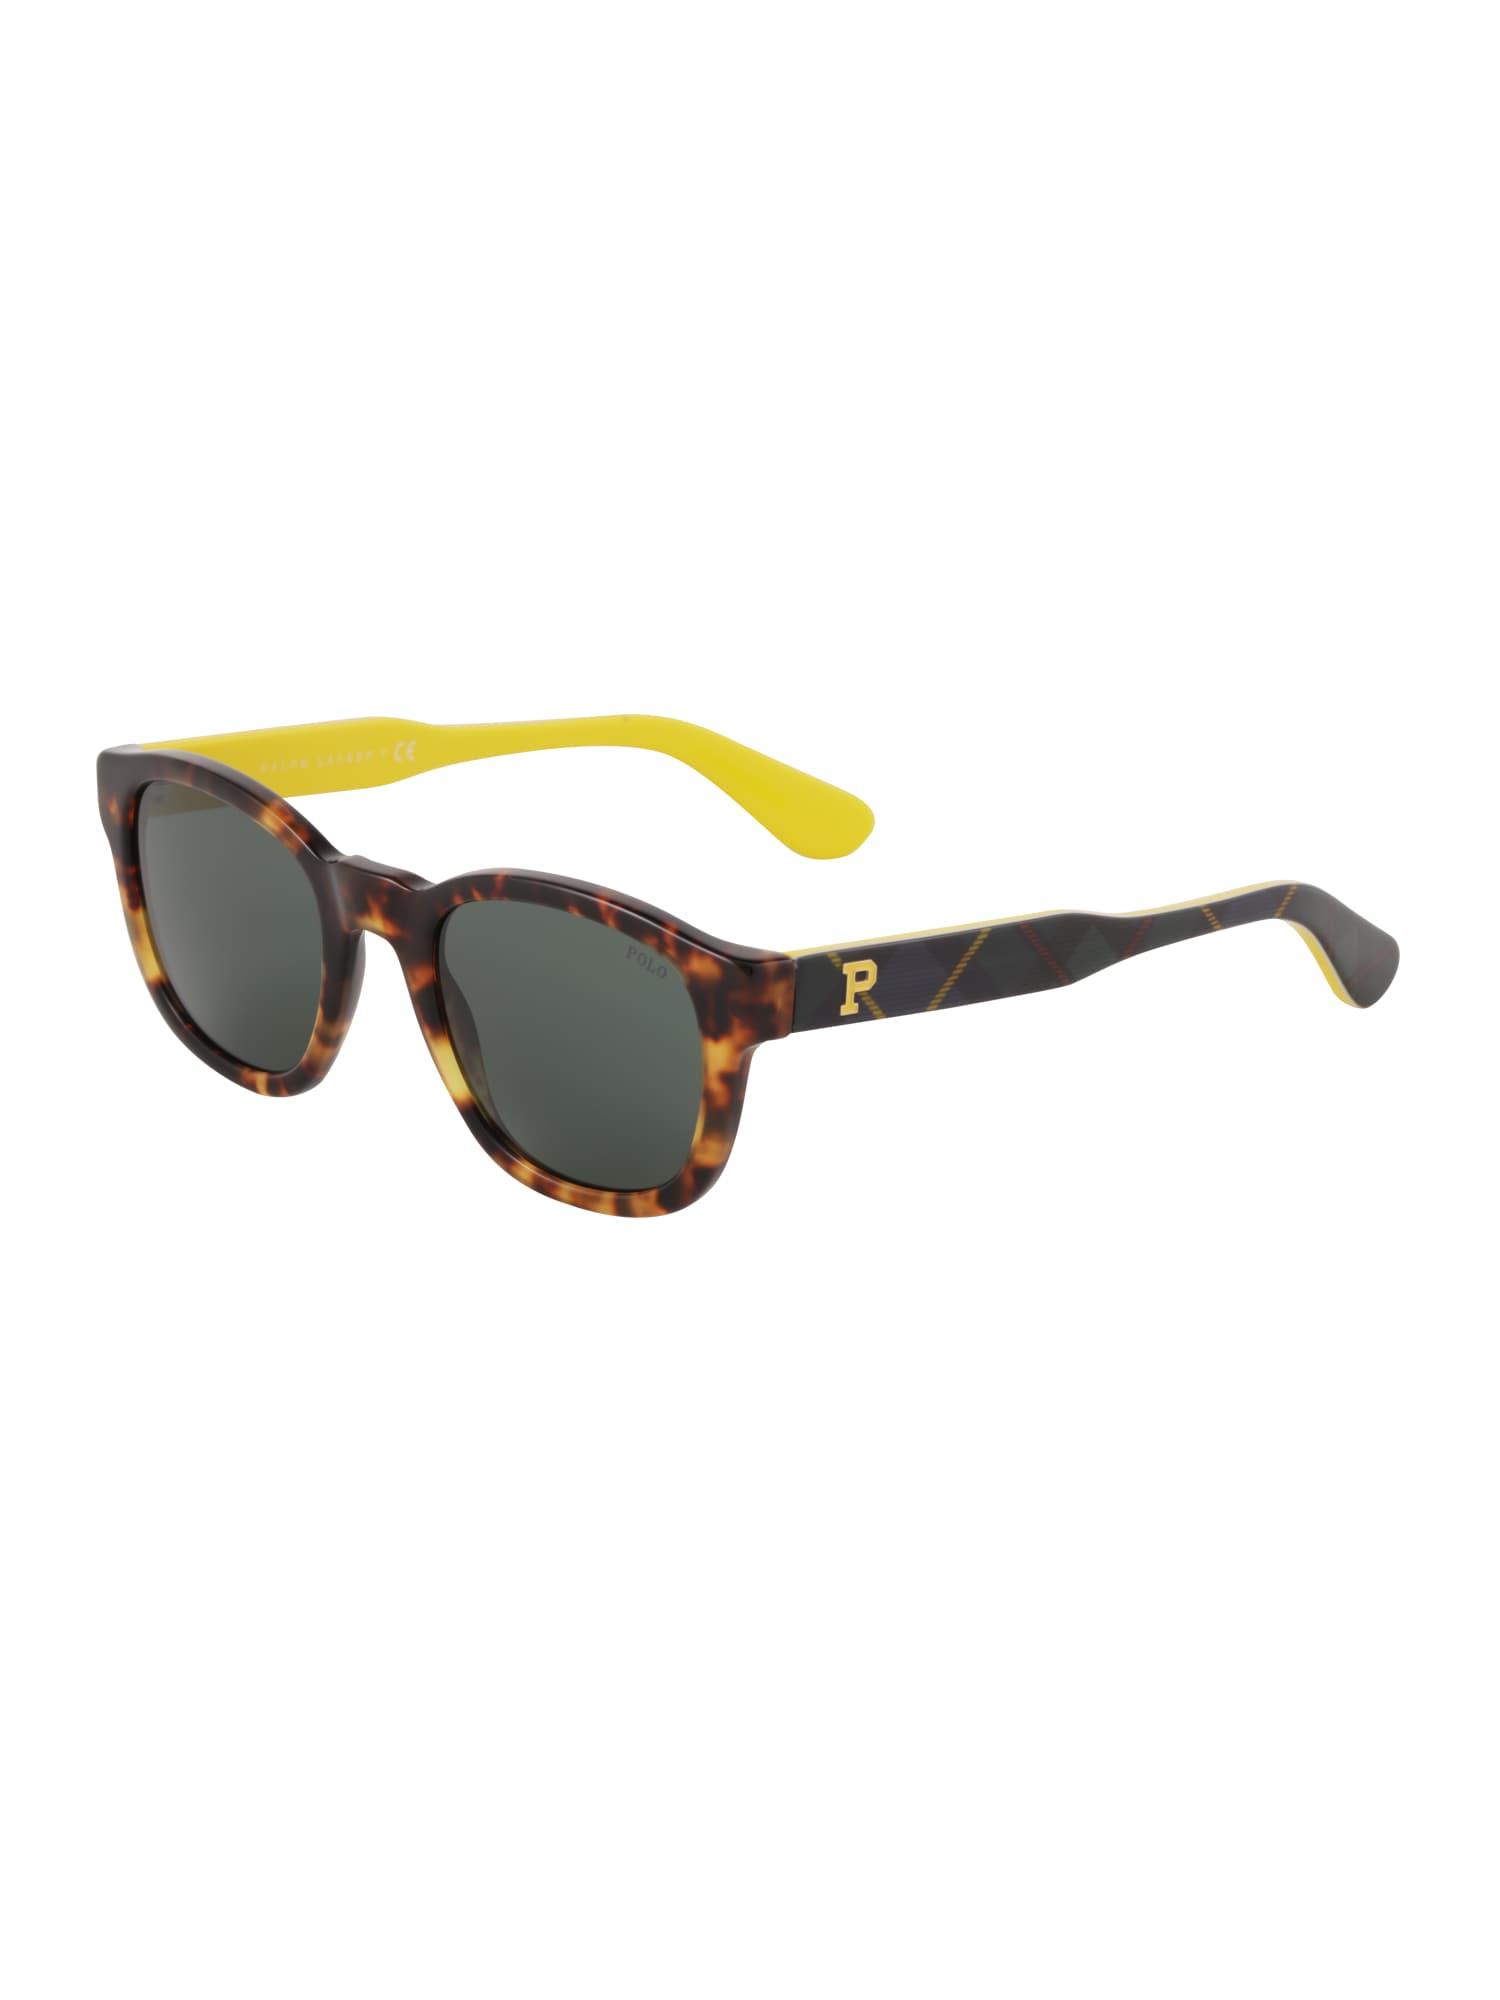 POLO RALPH LAUREN Slnečné okuliare '0PH4159'  hnedé / žlté